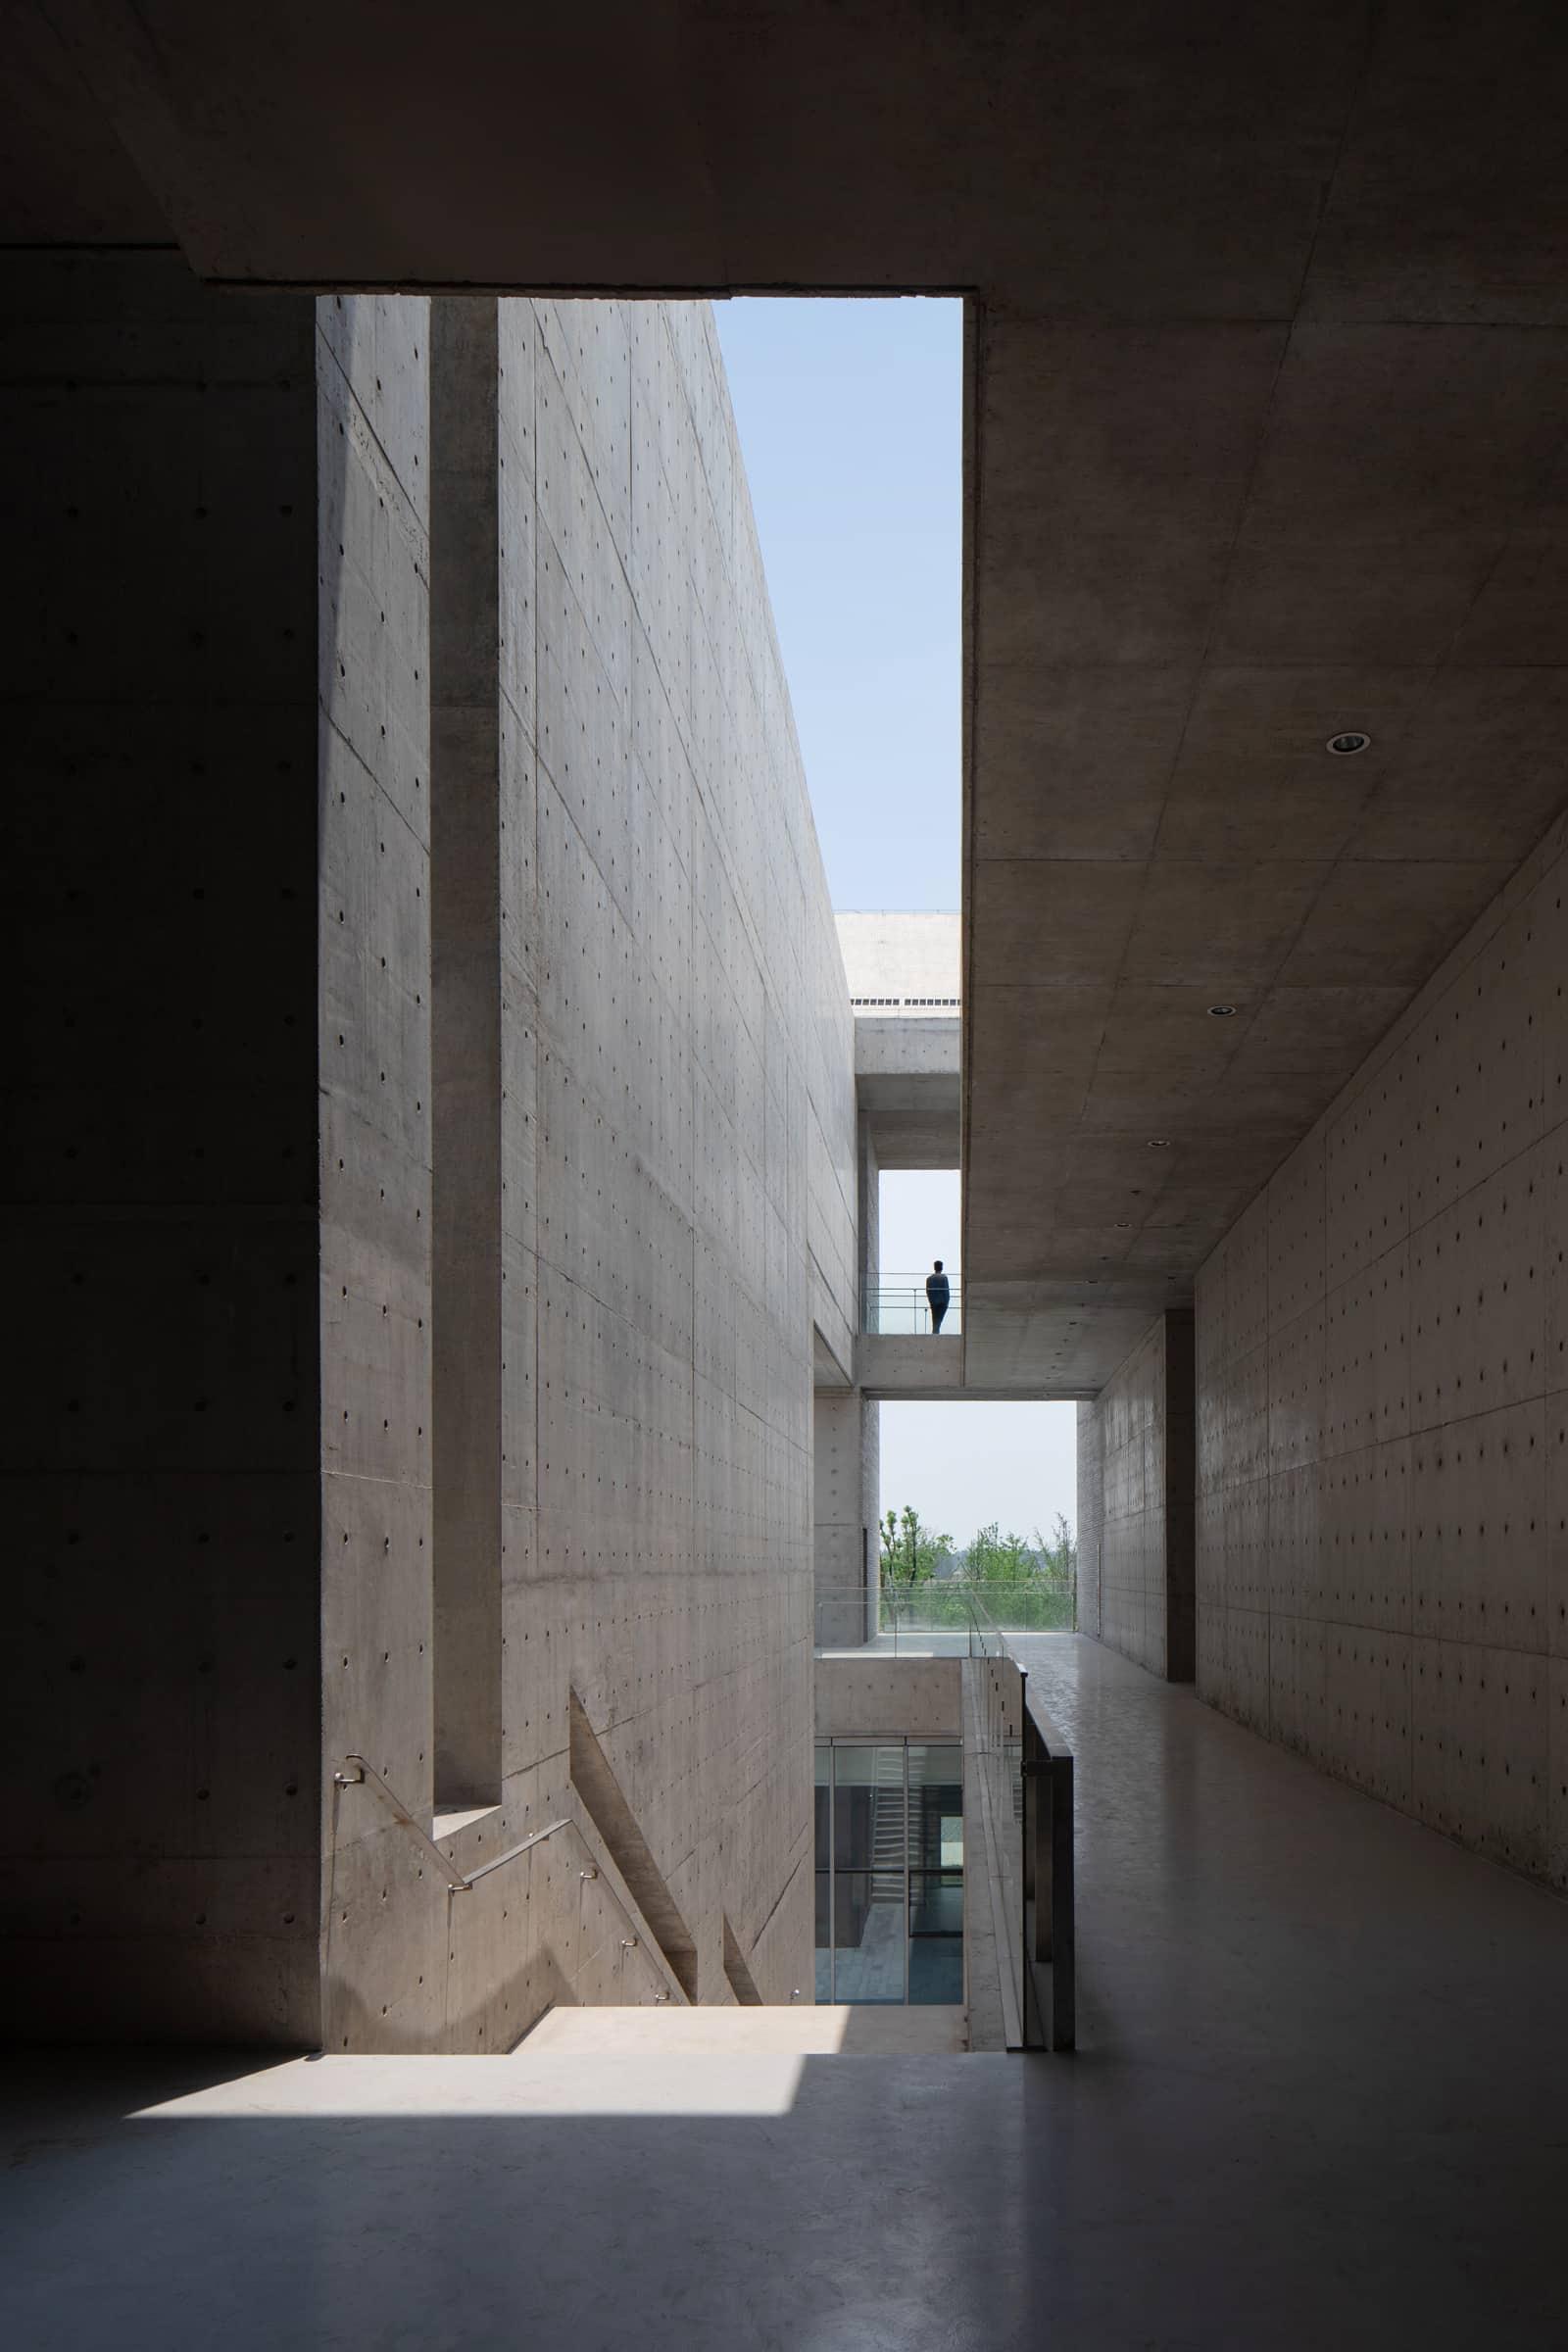 Shou County Culture and Art Center  - 20210702 Zhu Pei ShouCountyCultureArtCenter 11.1 55